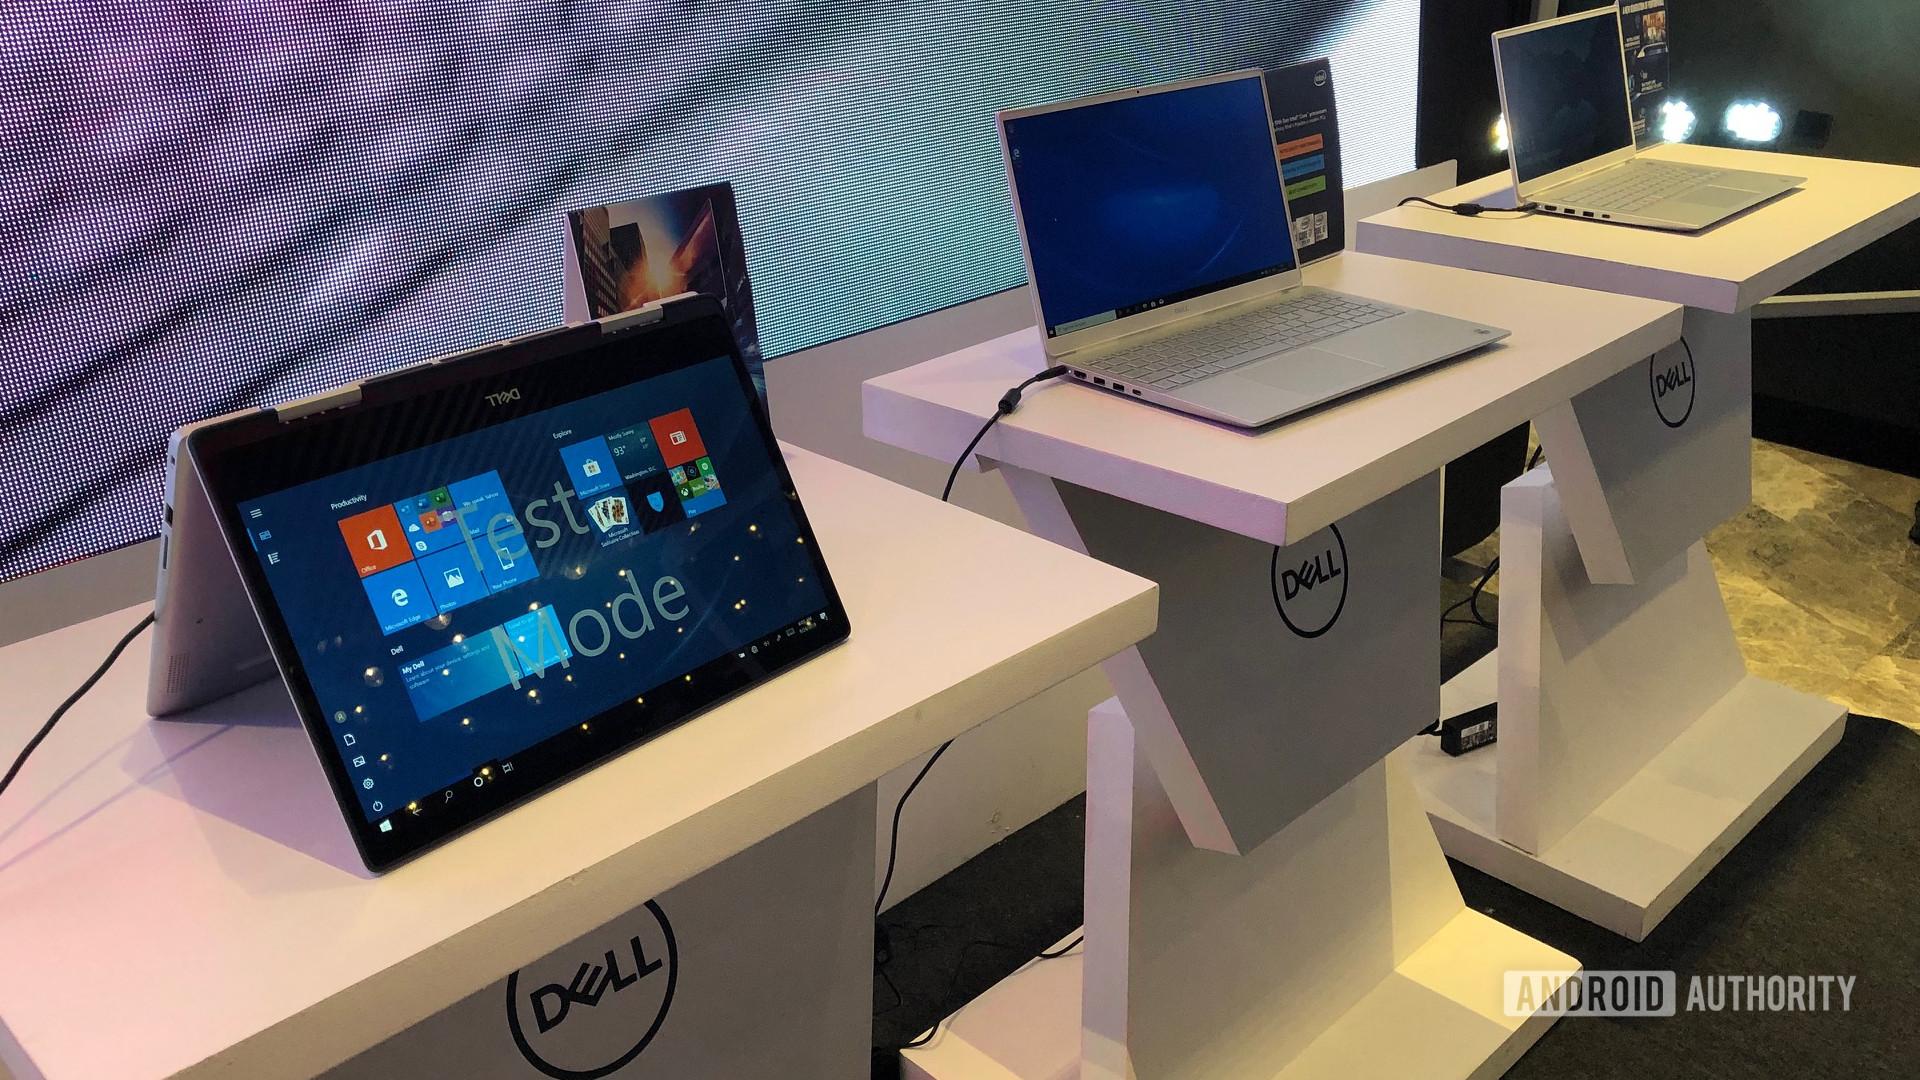 Dell Inspiron 7000 5000 2019 series